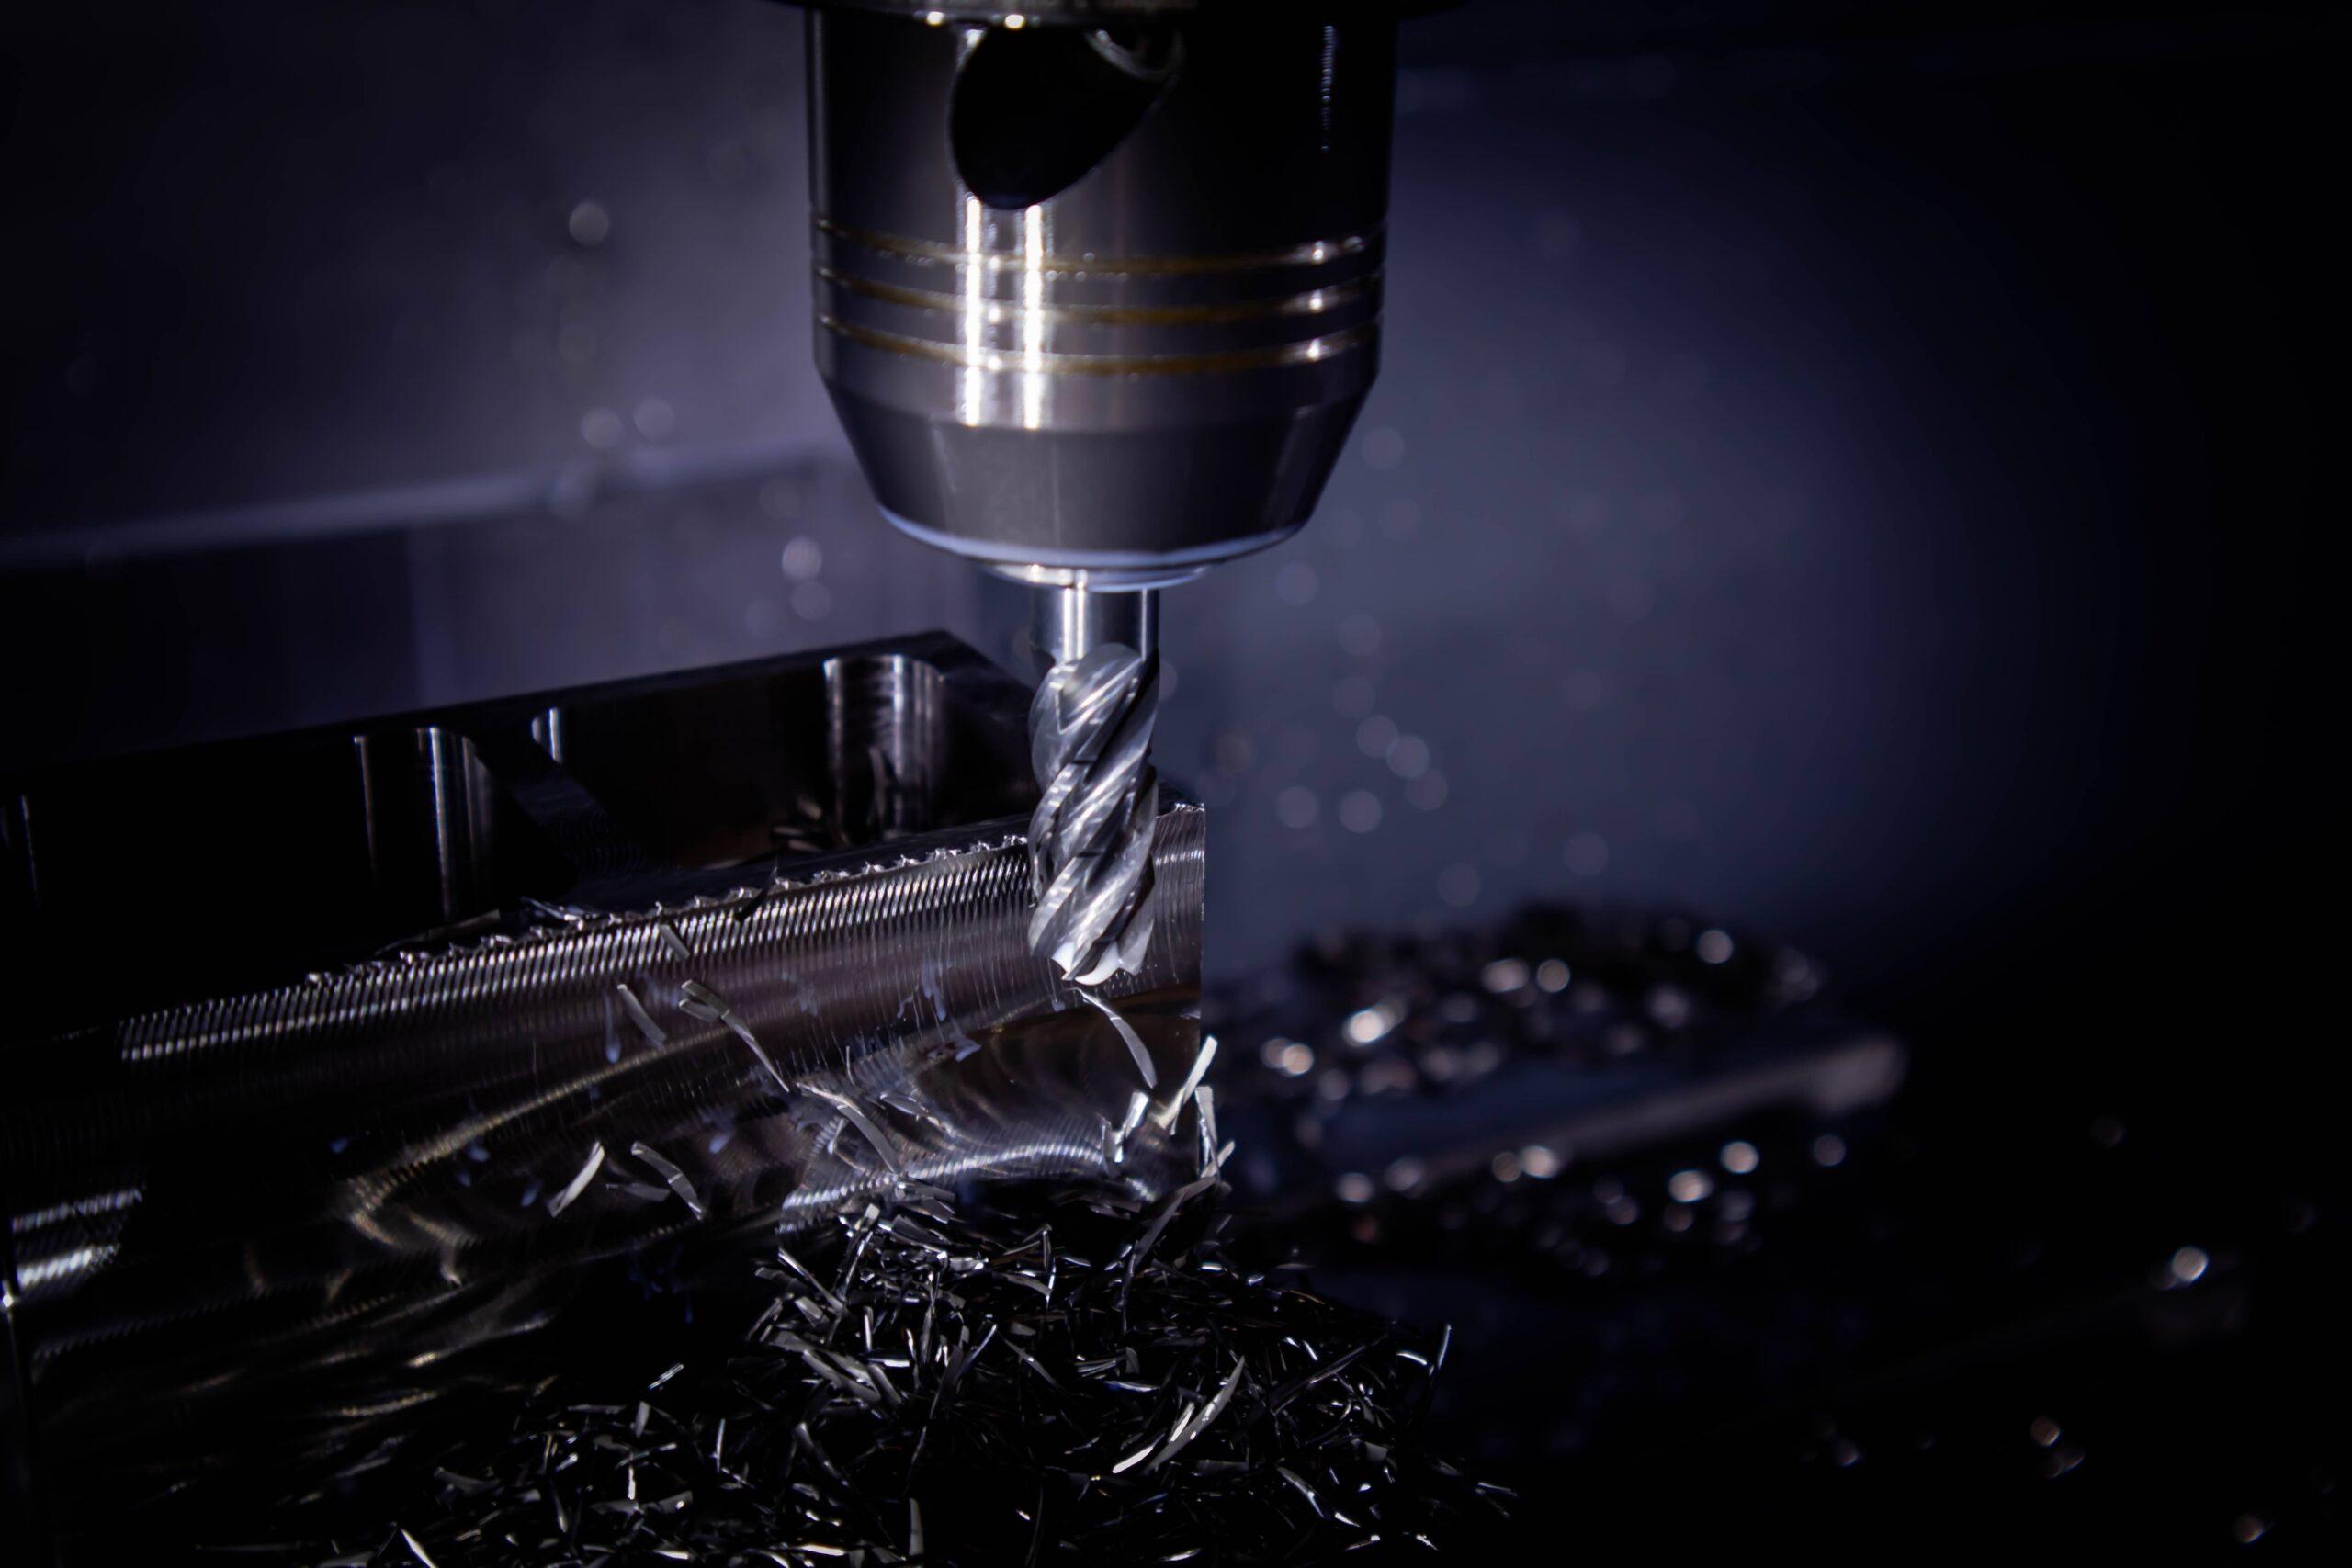 CNC Turning and Milling Machining Explained